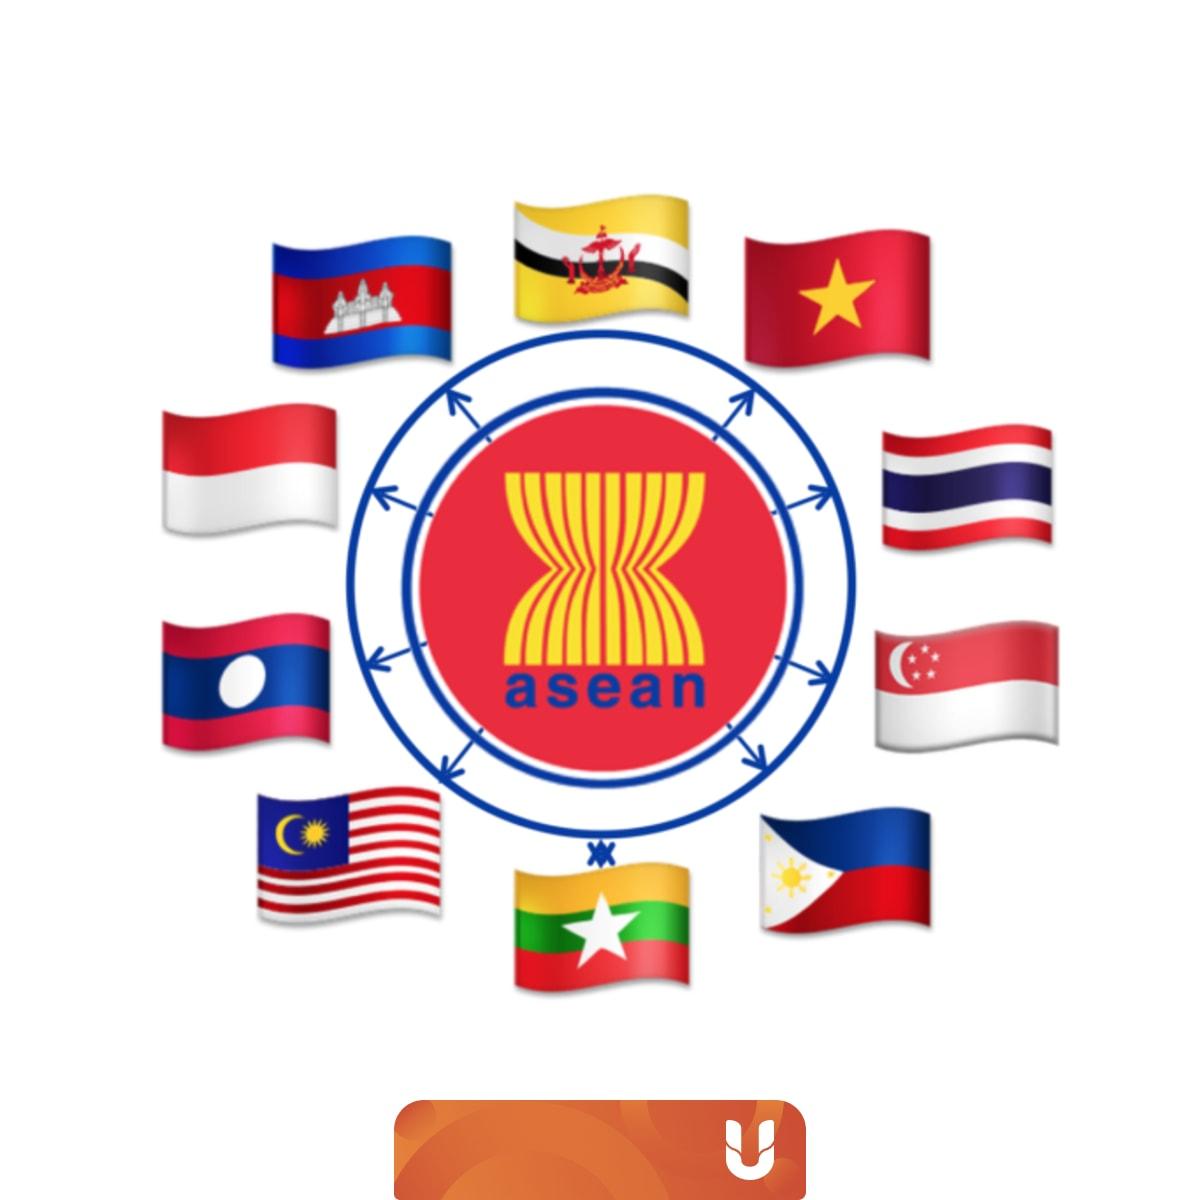 33+ Negara di asia tenggara yang mendapatkan julukan sebagai negeri gajah putih adalah thailand ideas